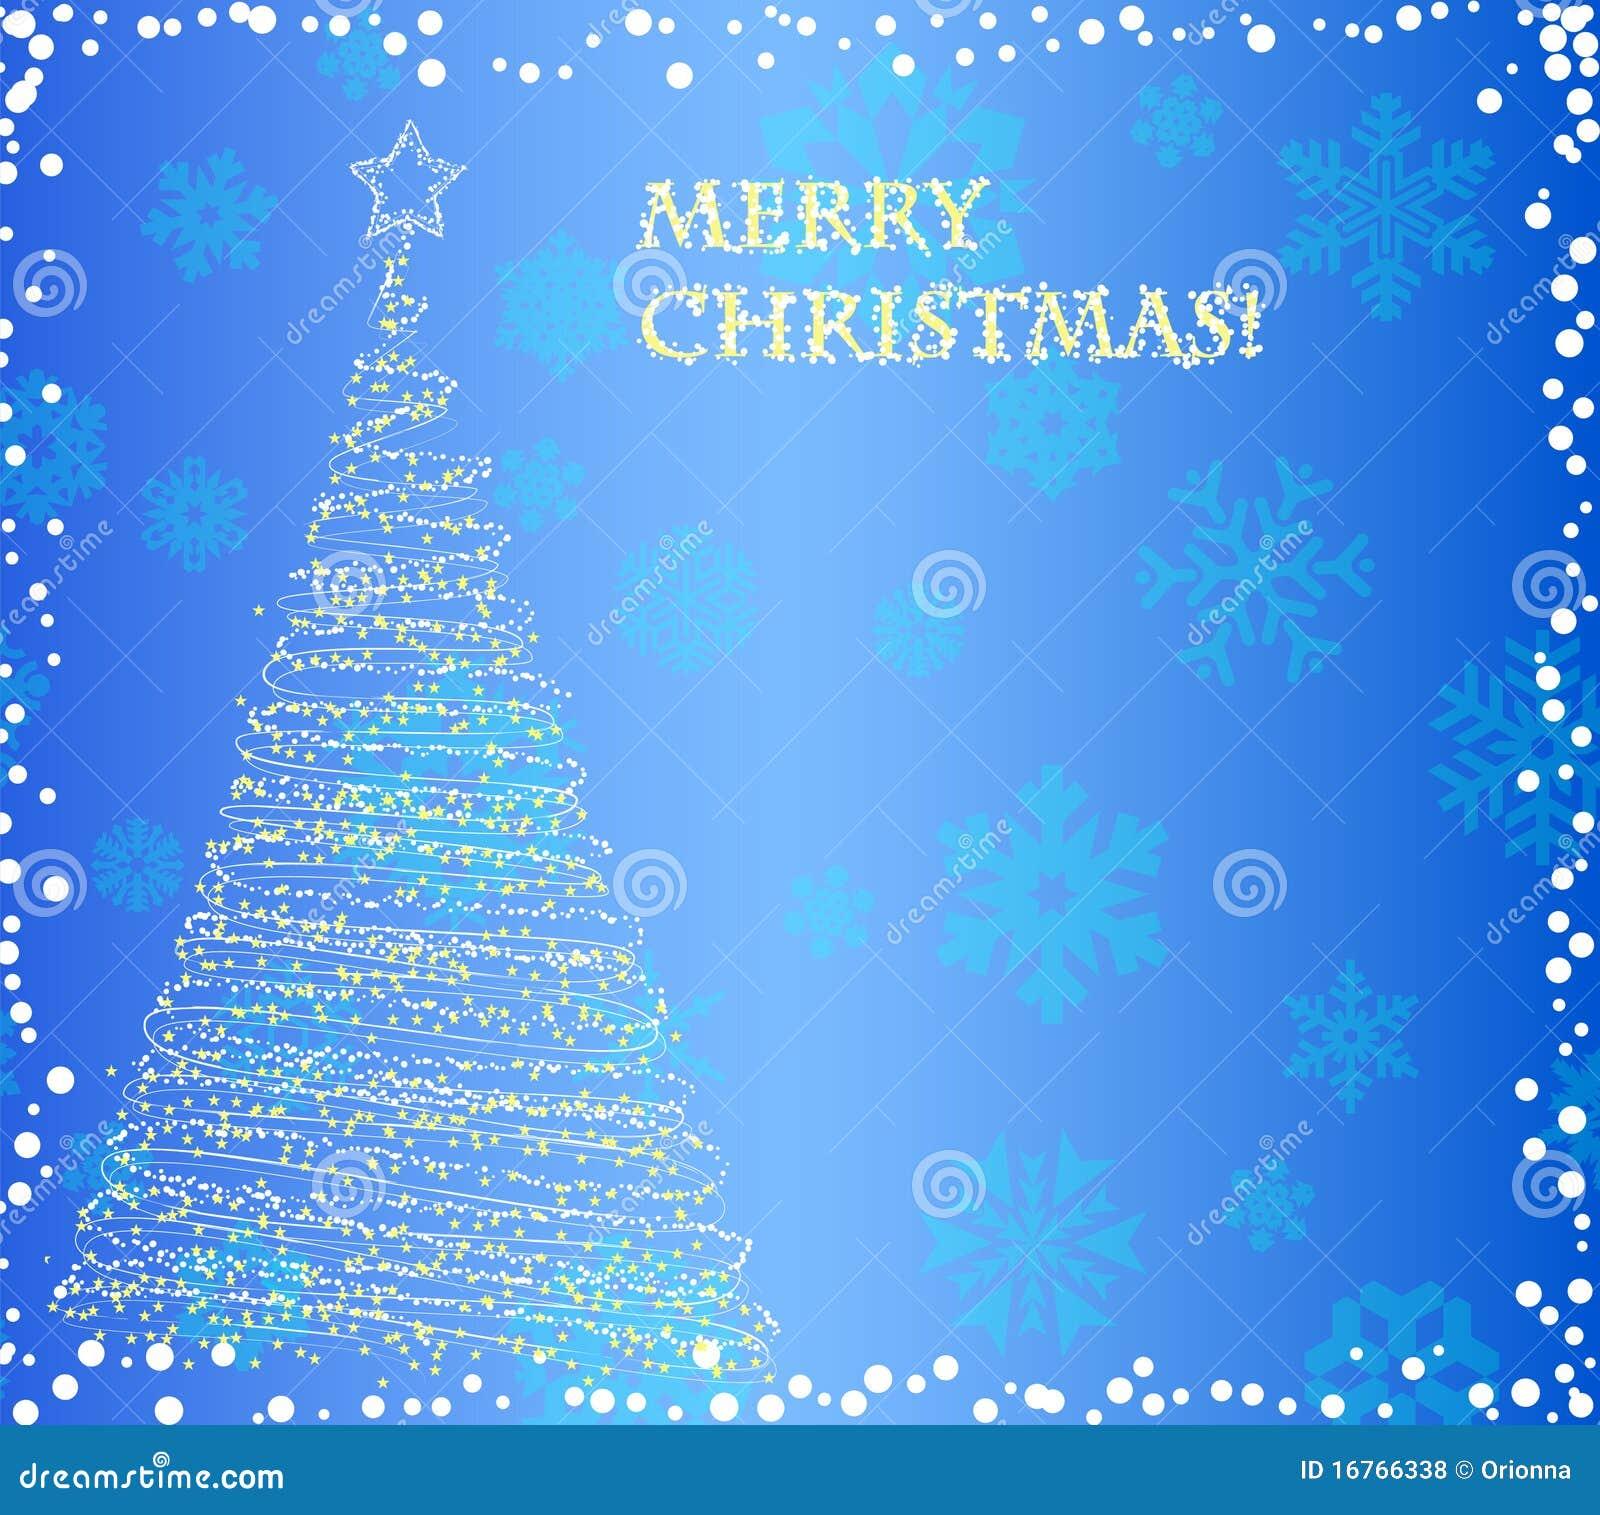 Beautiful Elegant Christmas Tree On The Blue Background